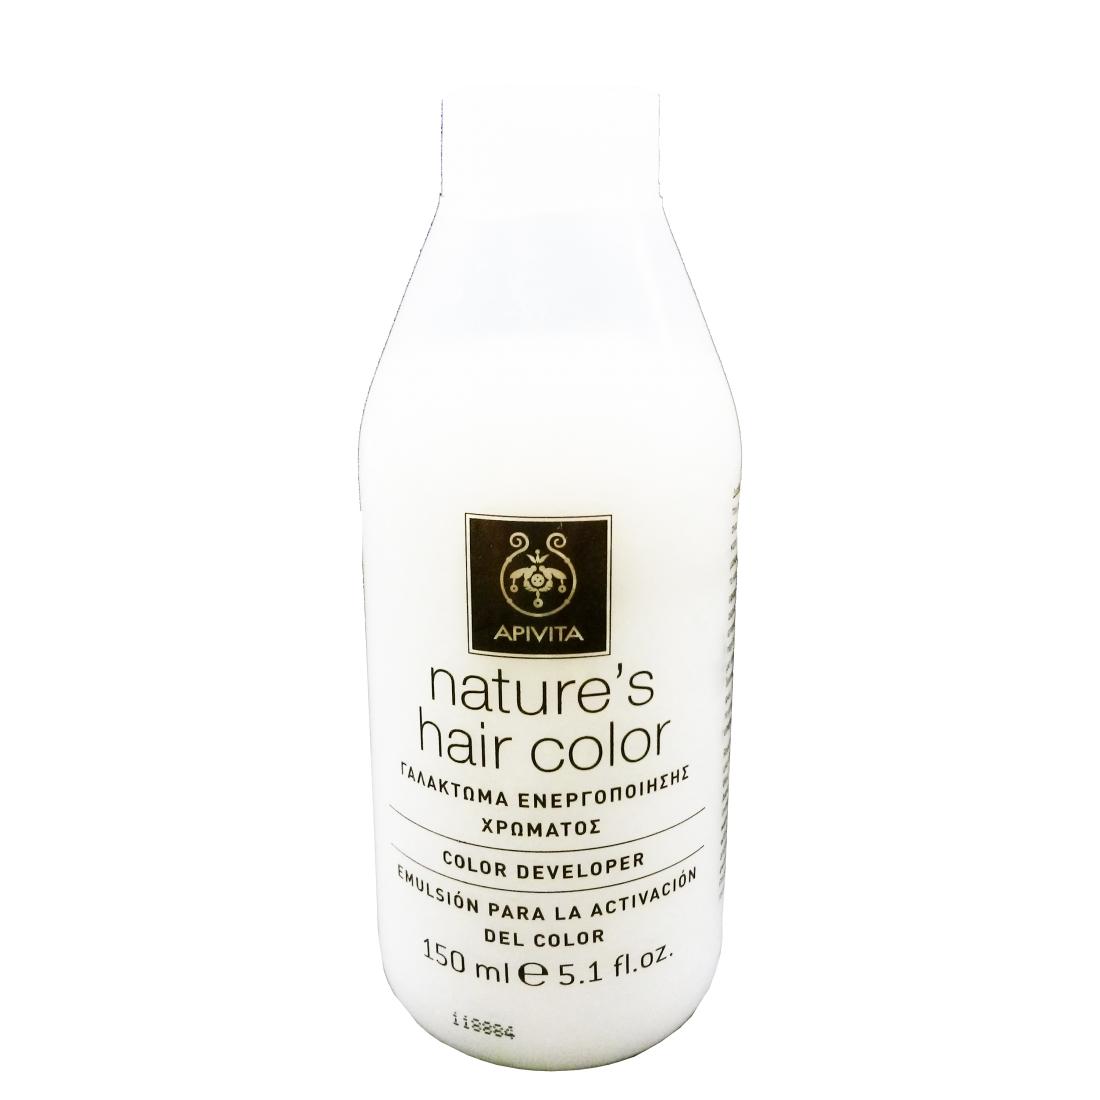 Apivita Natures Hair Color Ενεργοποιητής Χρώματος 150ml – 10